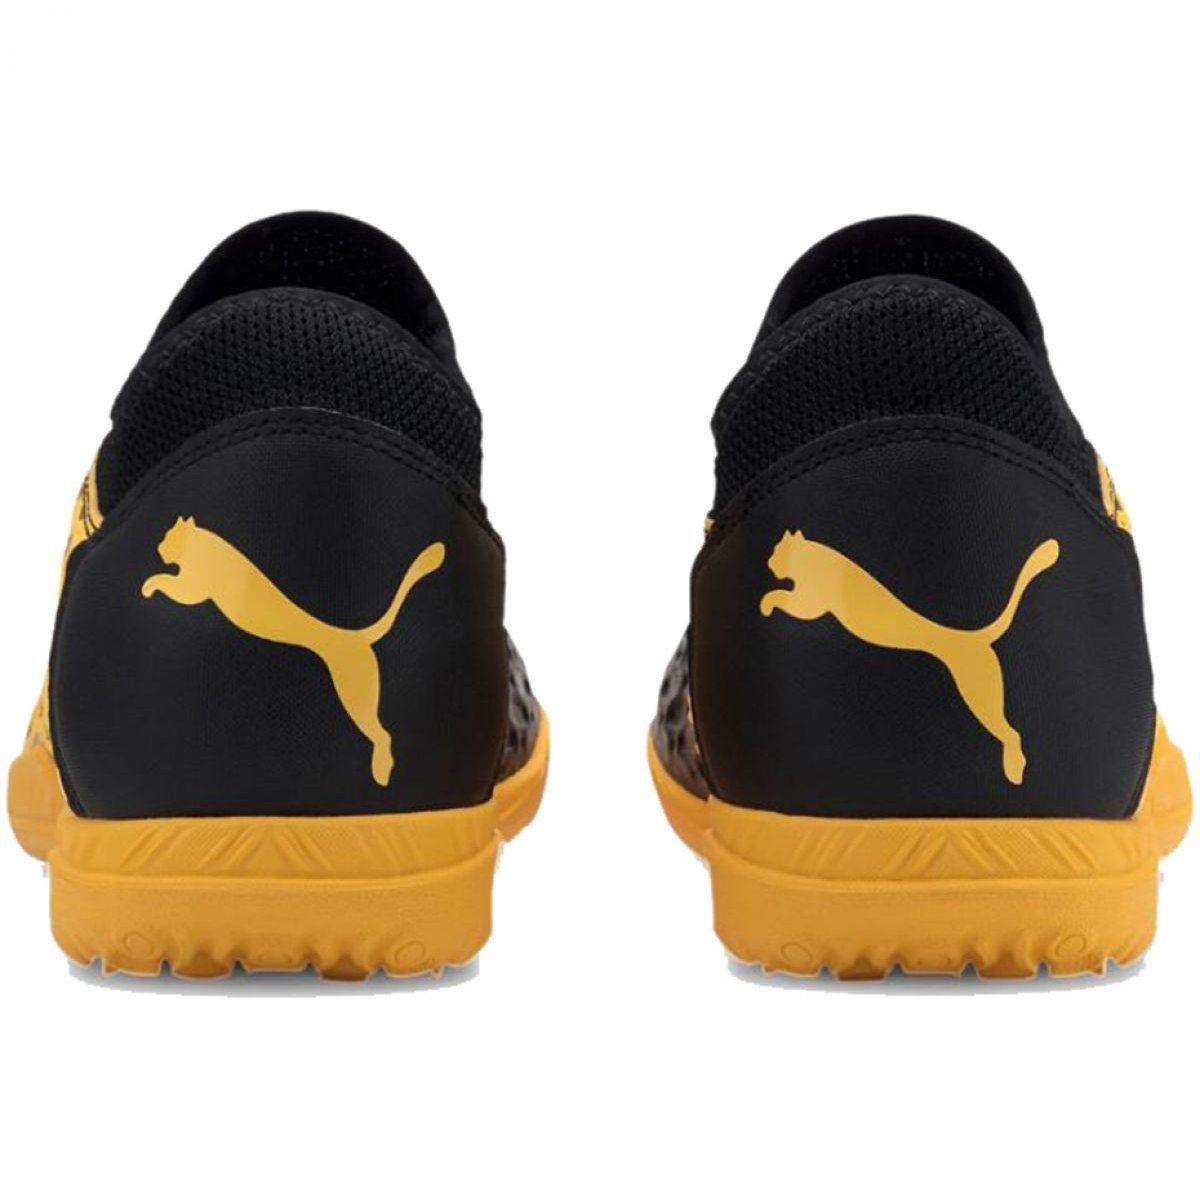 Buty Pilkarskie Puma Future 5 4 Tt M 105803 03 Zolte Zolte Puma Baby Shoes Sneakers